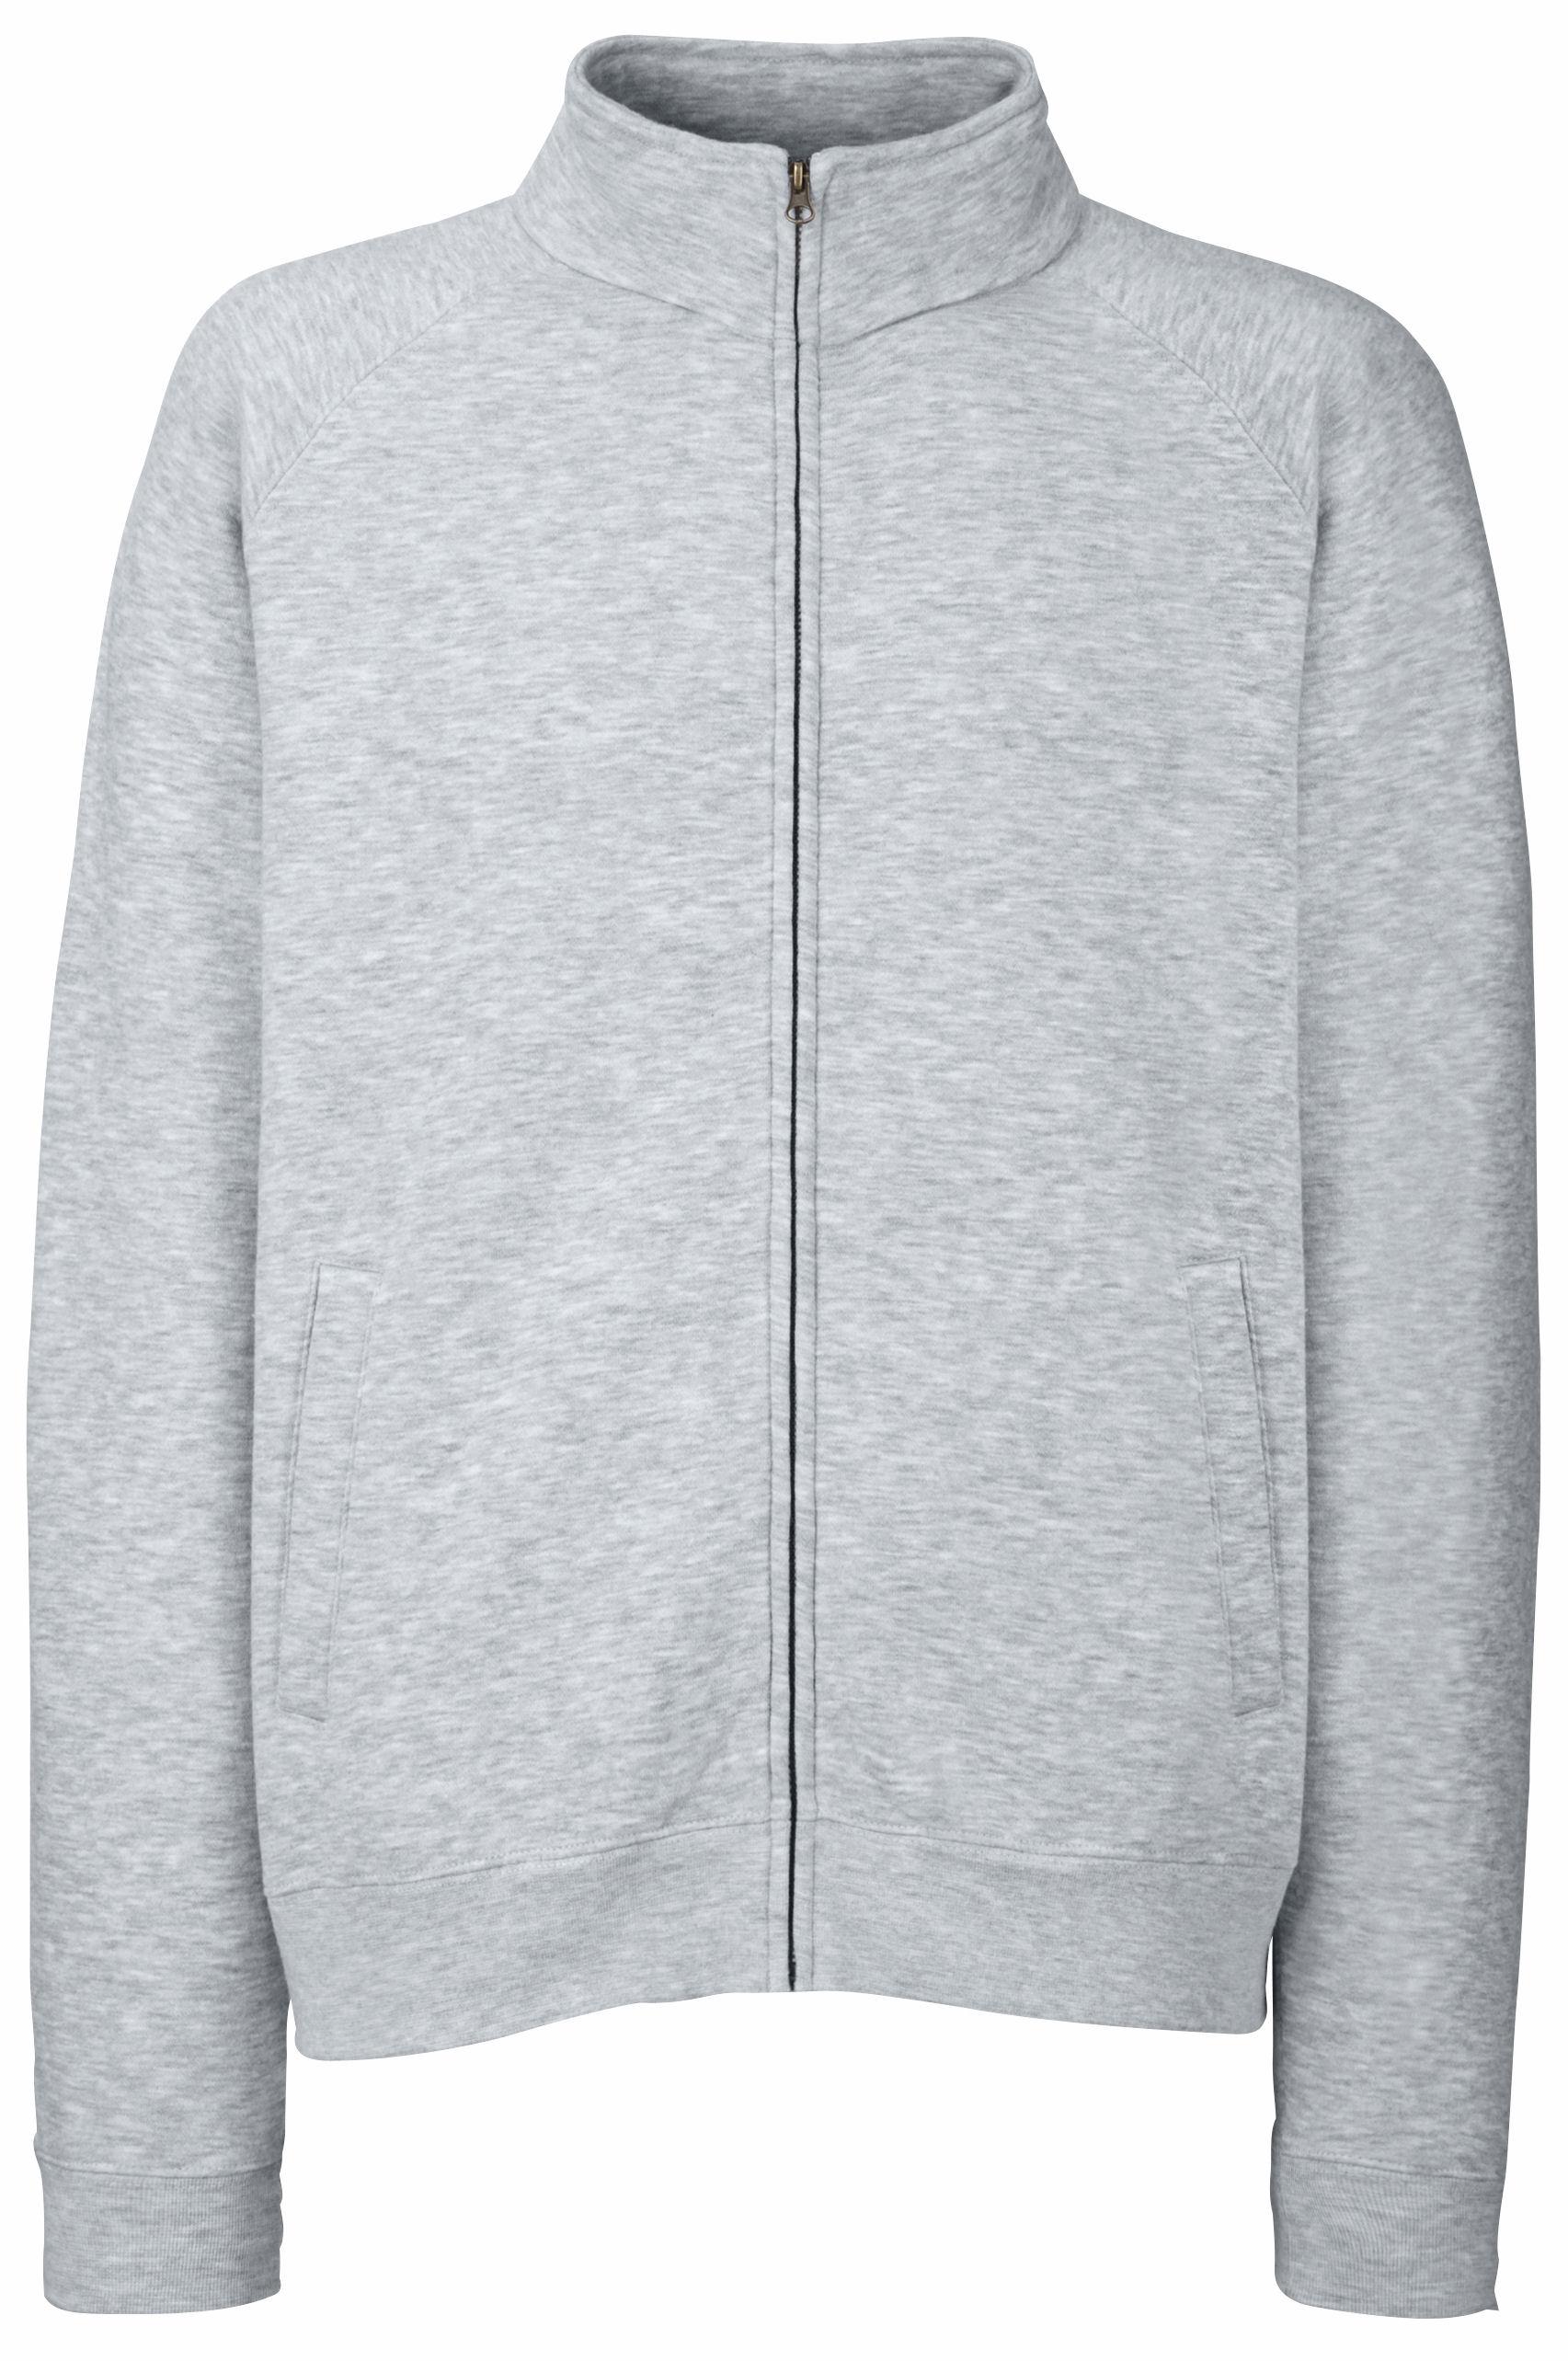 Sweat Jacket (New)